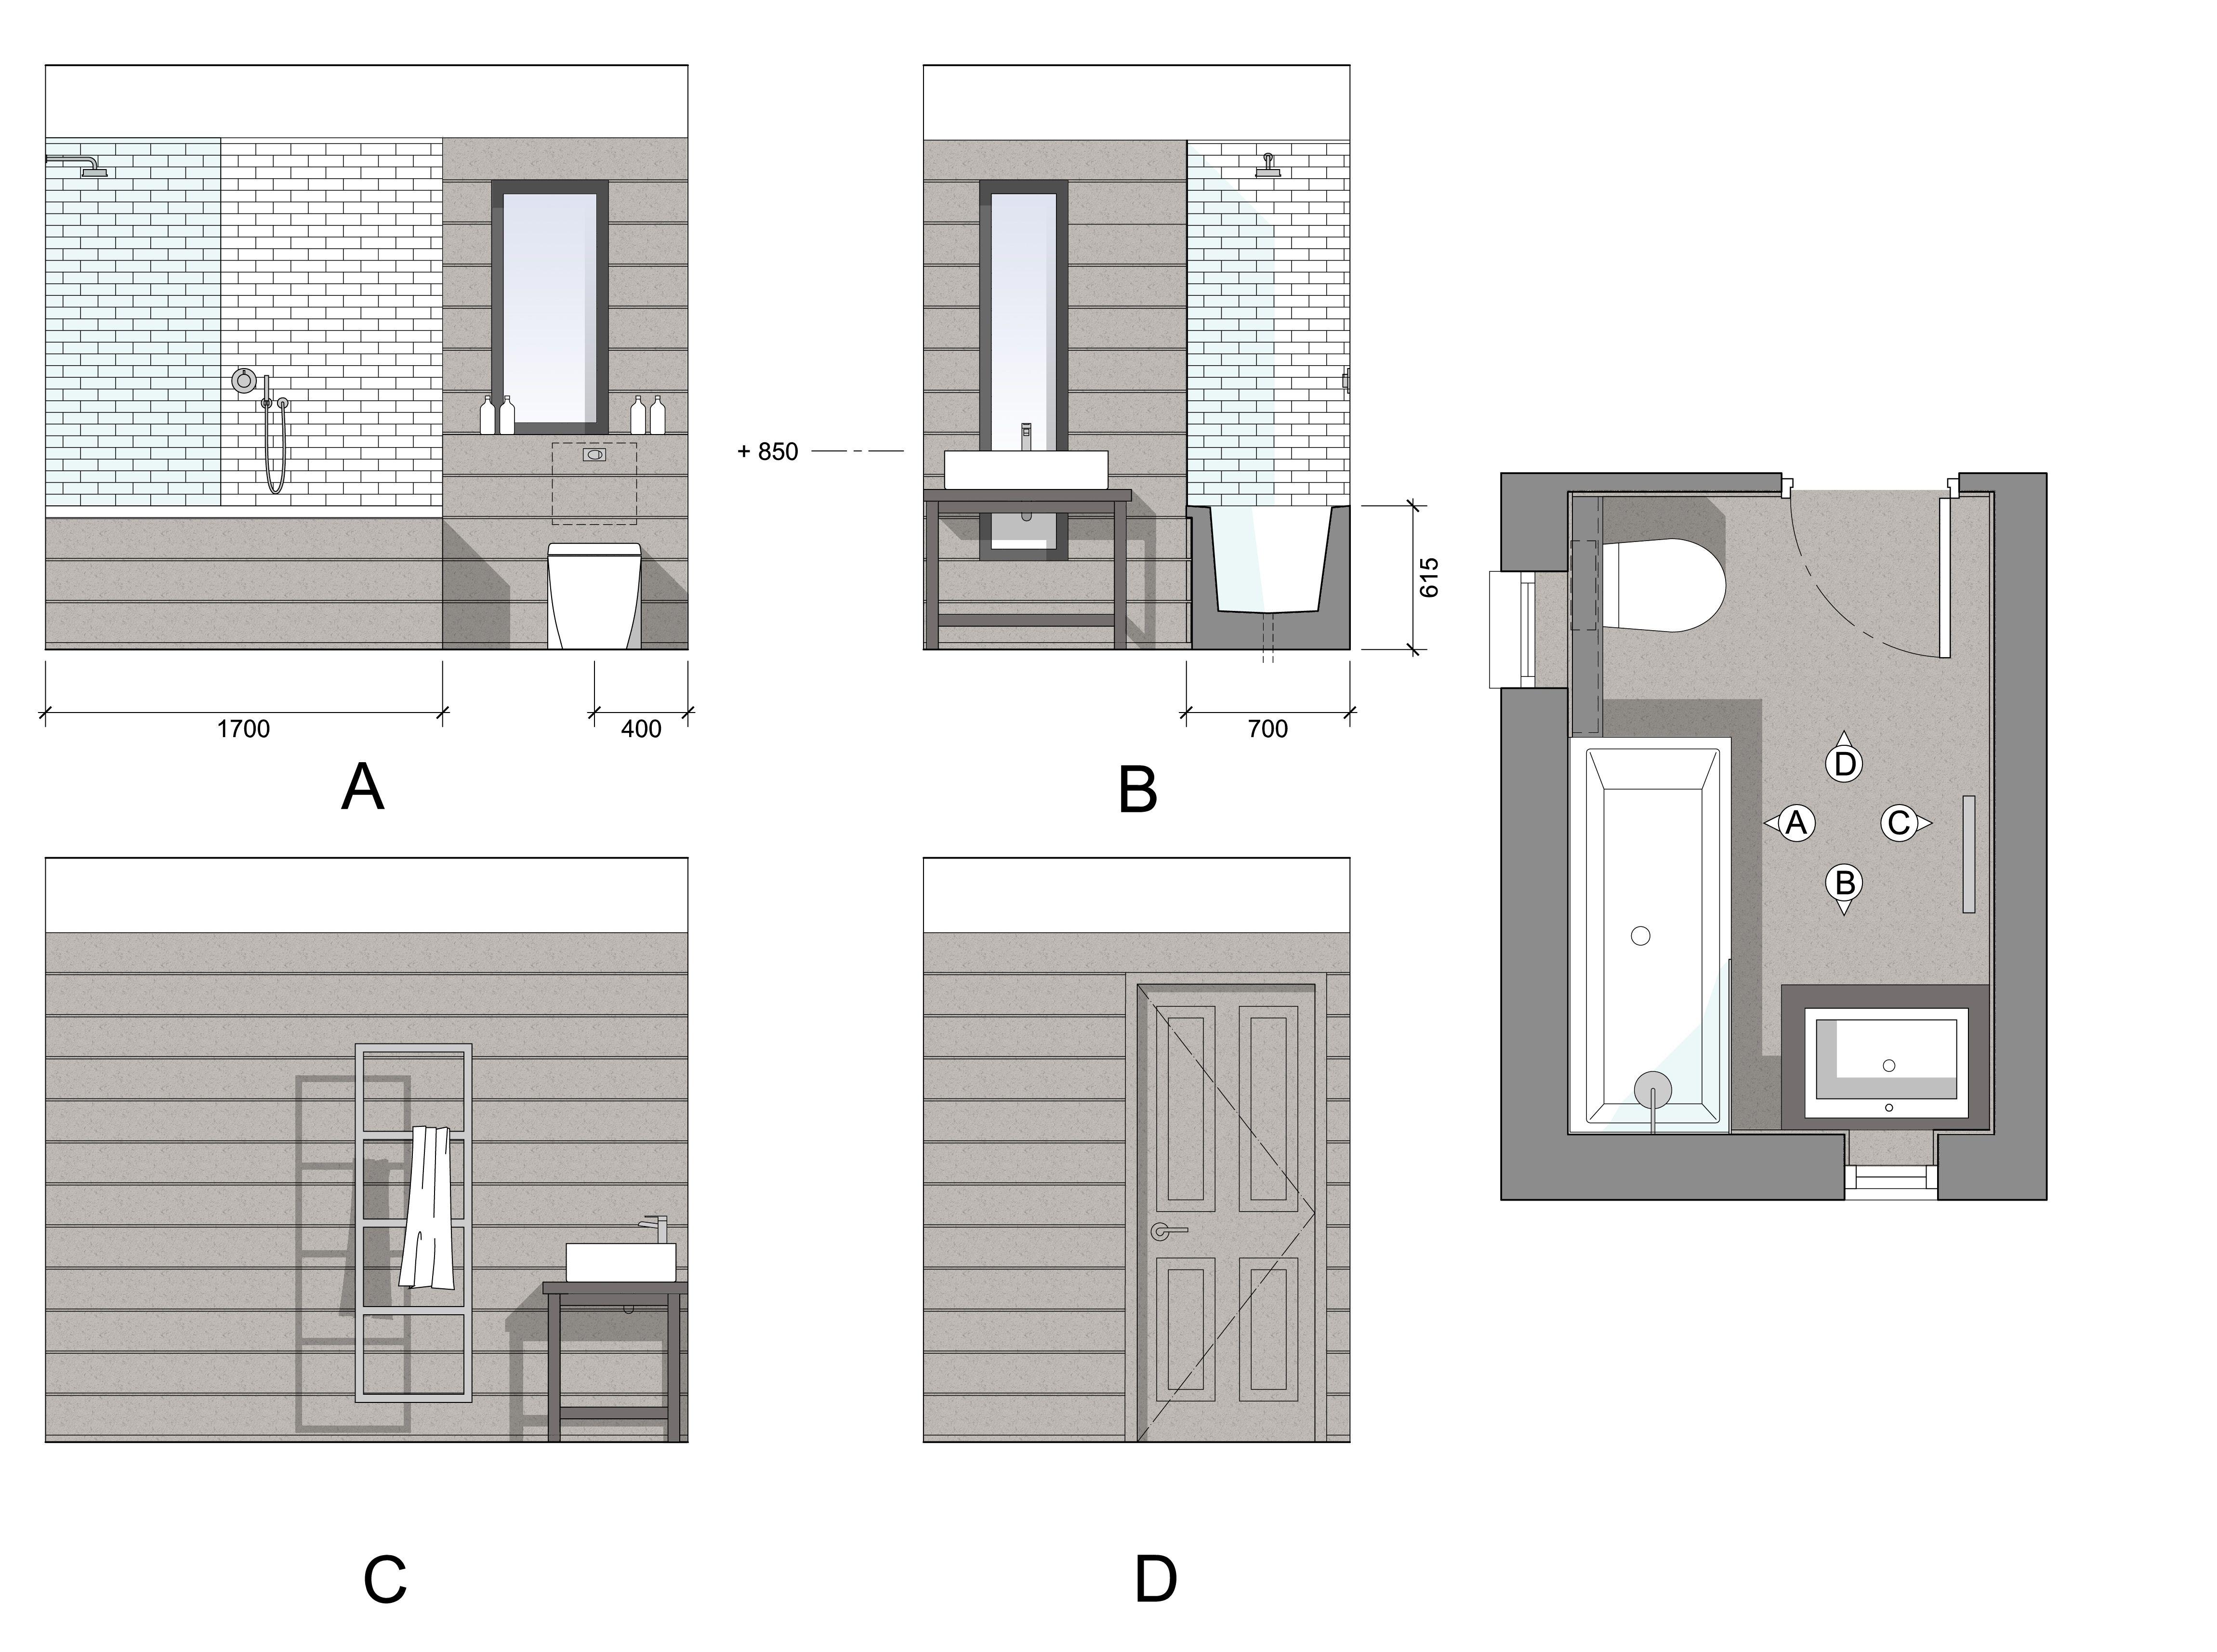 Bathroom elevations sample drawing